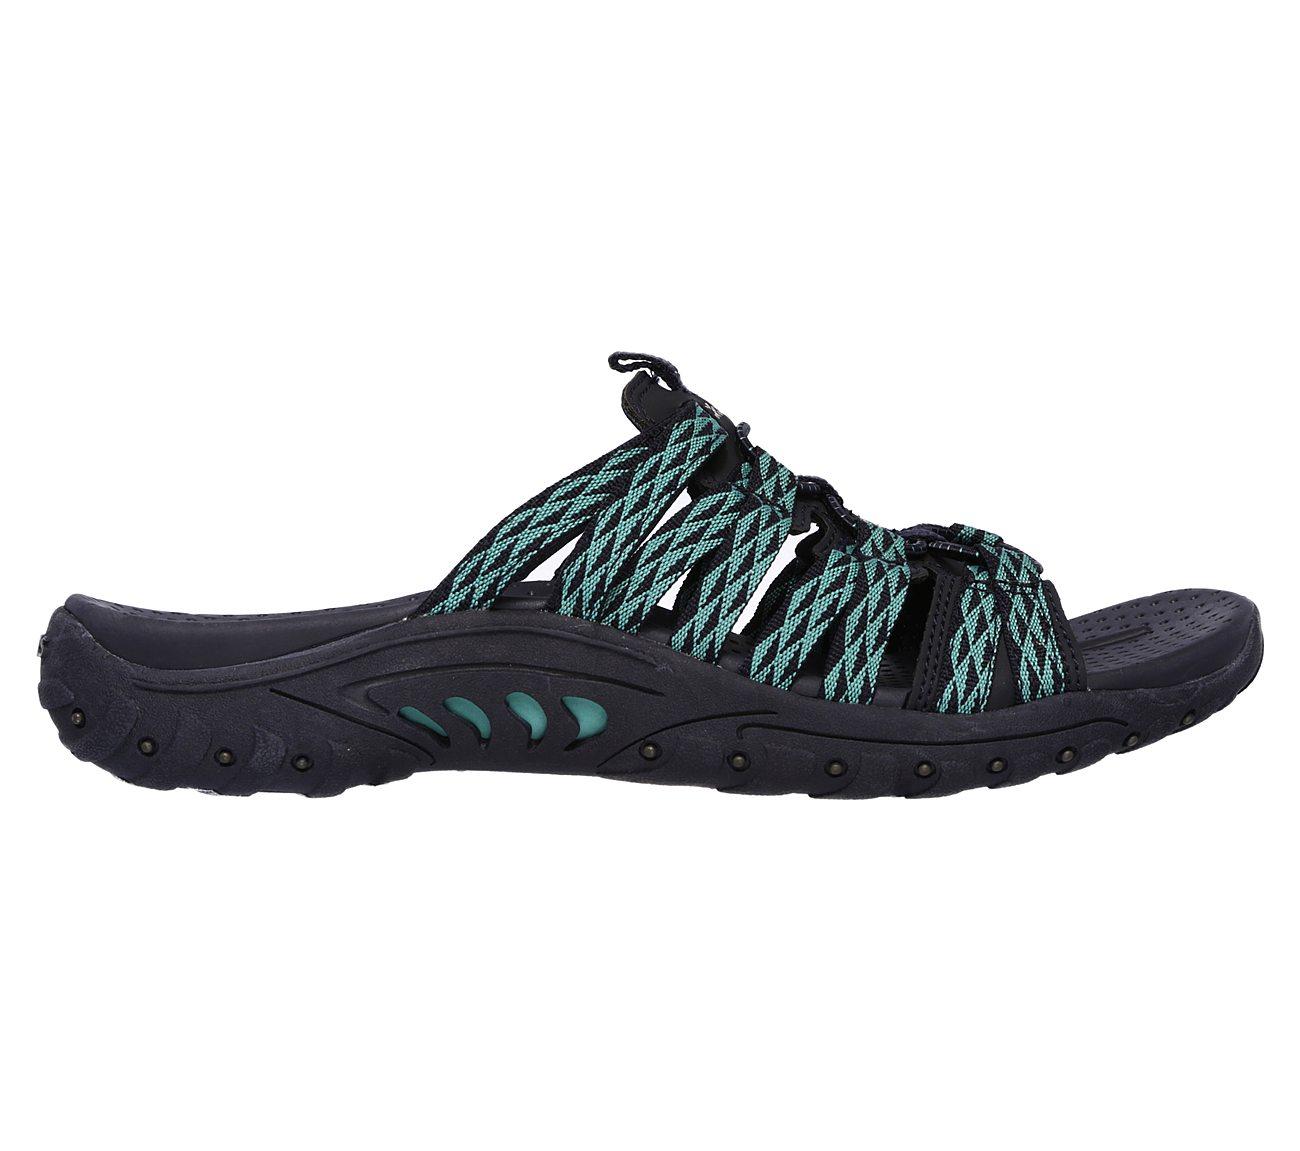 f57b62c1a823 Buy SKECHERS Reggae - Jabby Modern Comfort Shoes only  50.00